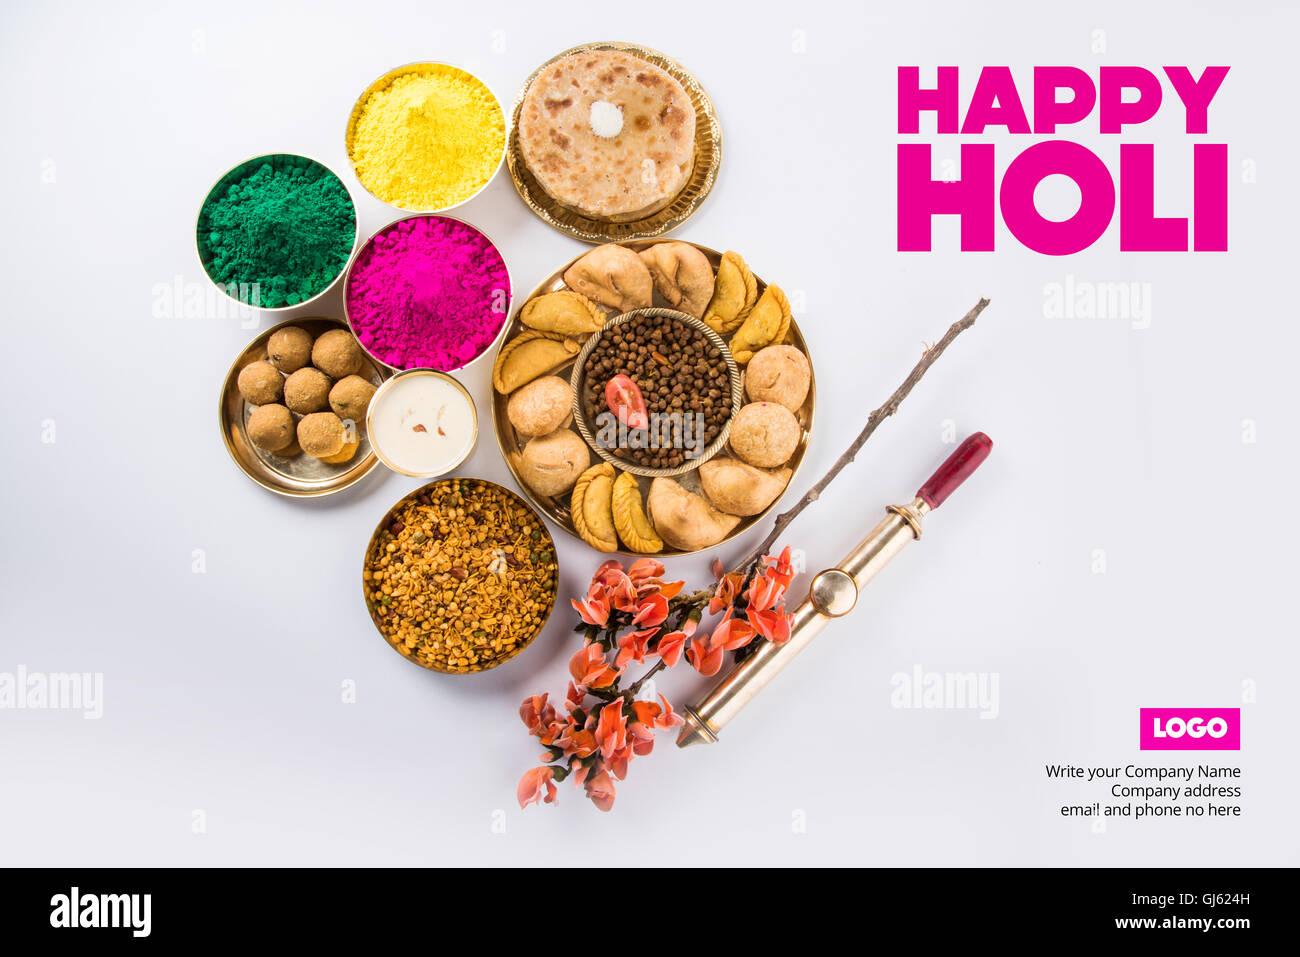 Happy holi greeting card holi wishes greeting card of indian happy holi greeting card holi wishes greeting card of indian festival of colours called holi seasons greetings kristyandbryce Image collections